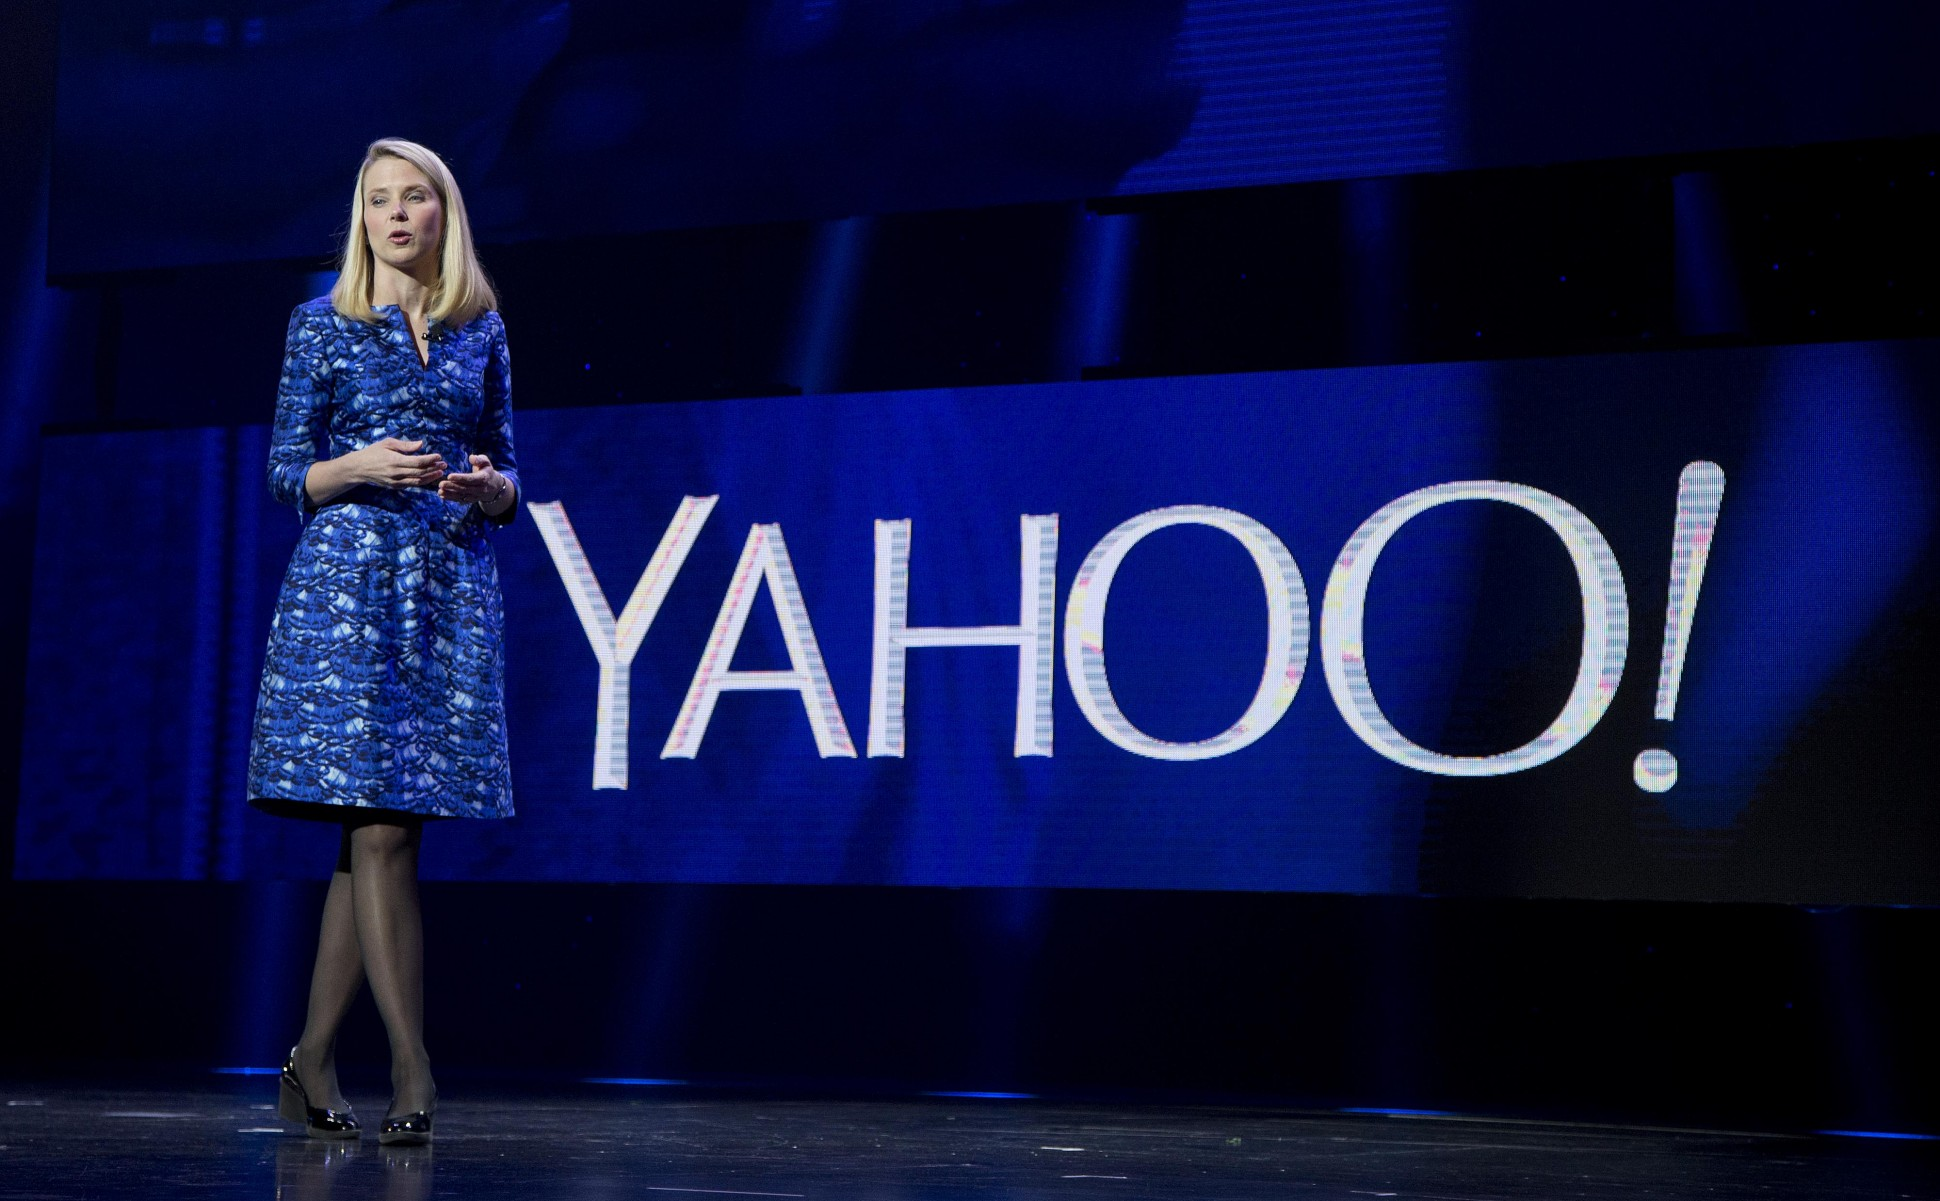 Yahoo slideshow 10 - Marissa Meyer